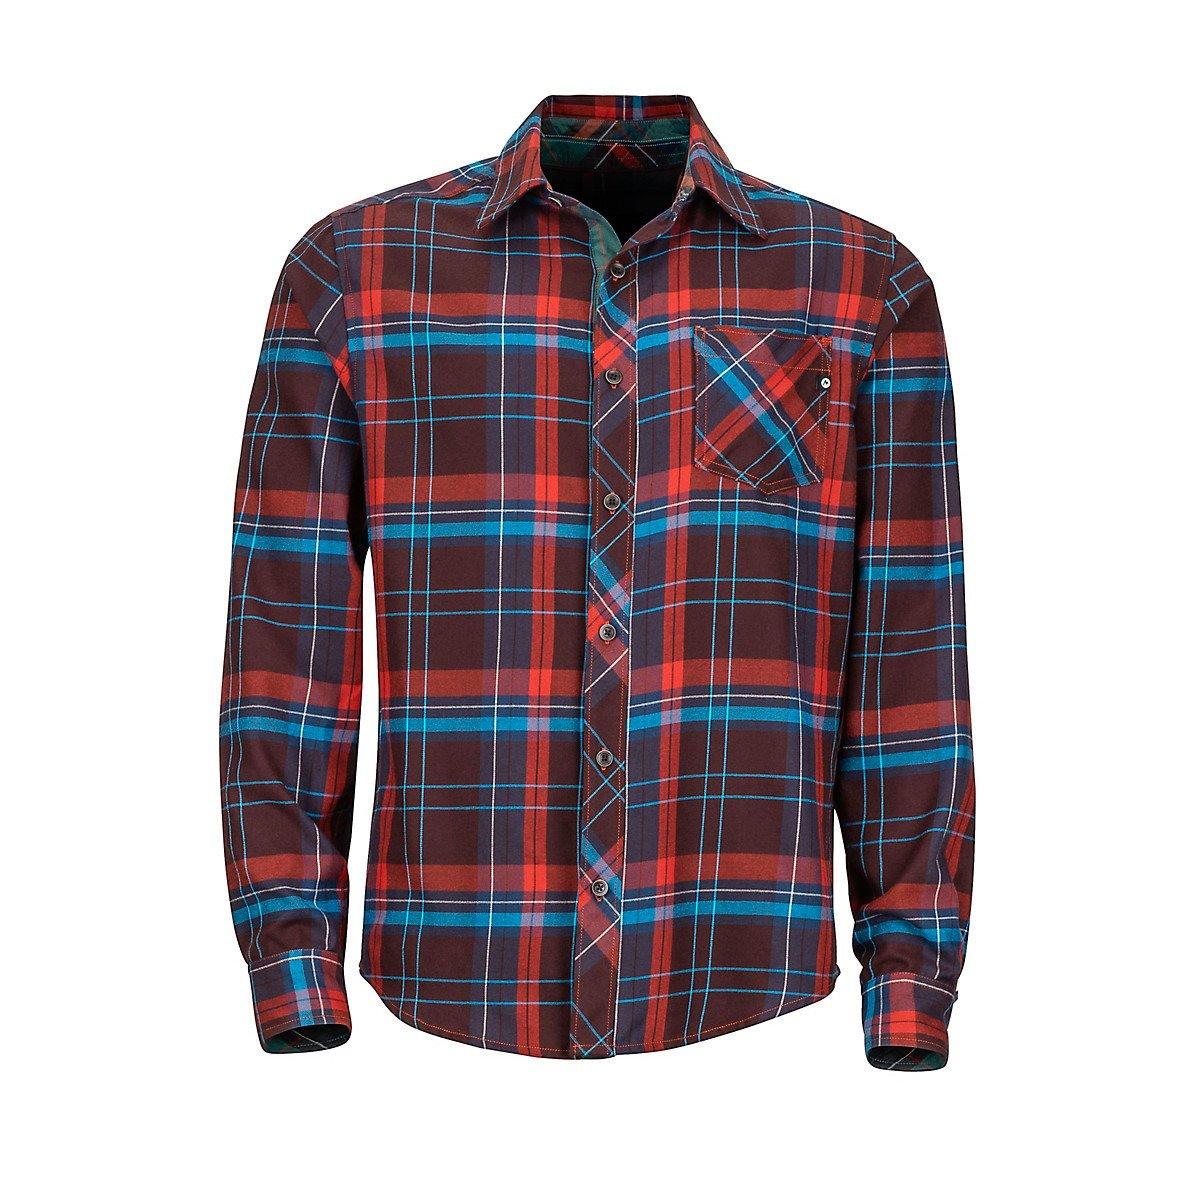 Koszula ANDERSON LIGHTWEIGHT FLANNEL | odzież męska  szvpp